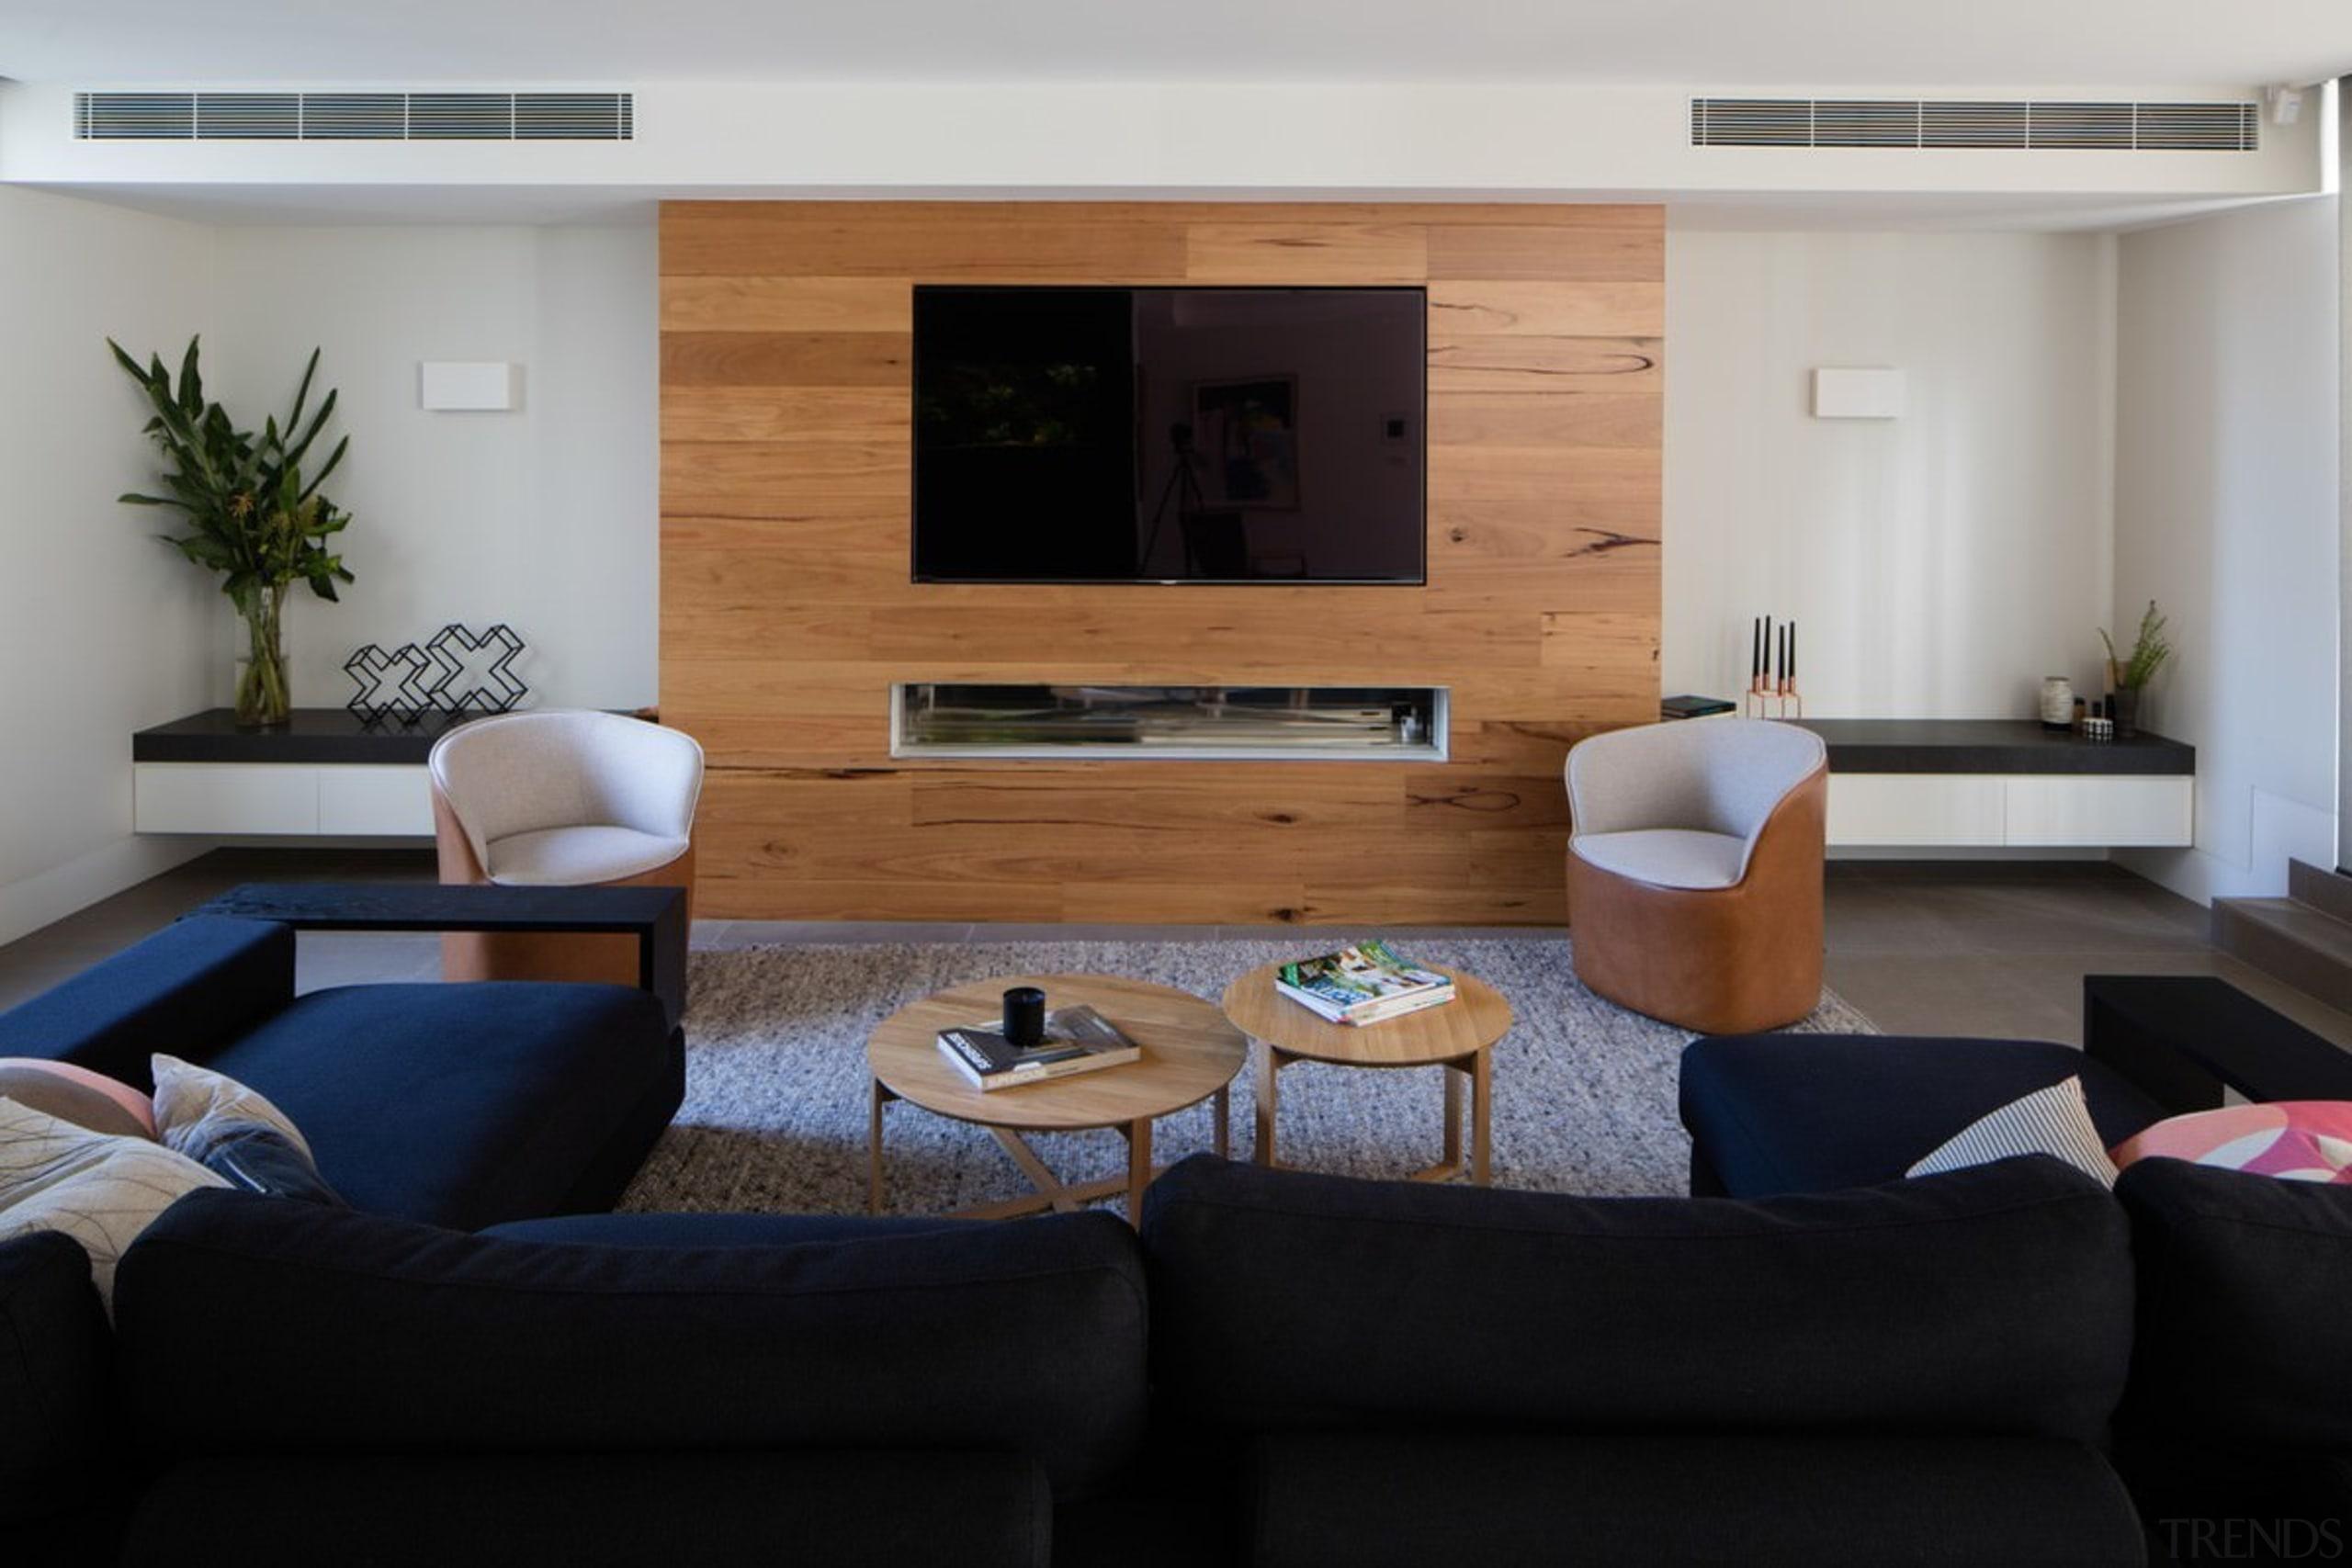 Architect: Damon HillsPhotography by Nic Granleese floor, furniture, house, interior design, living room, room, table, gray, black